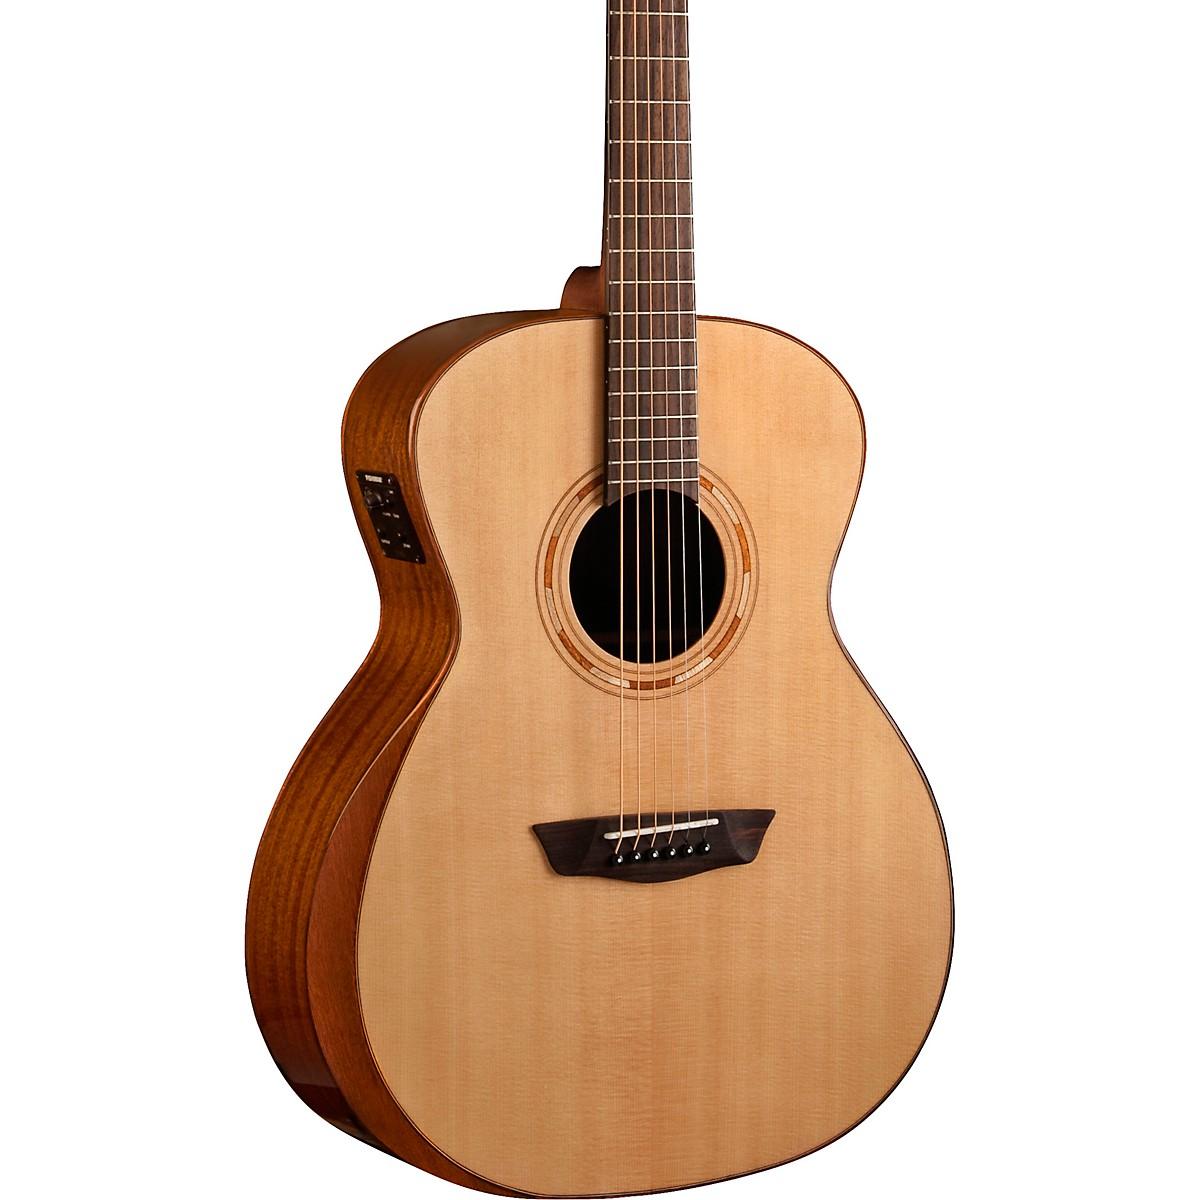 Washburn Comfort WCG10SENS Acoustic-Electric guitar